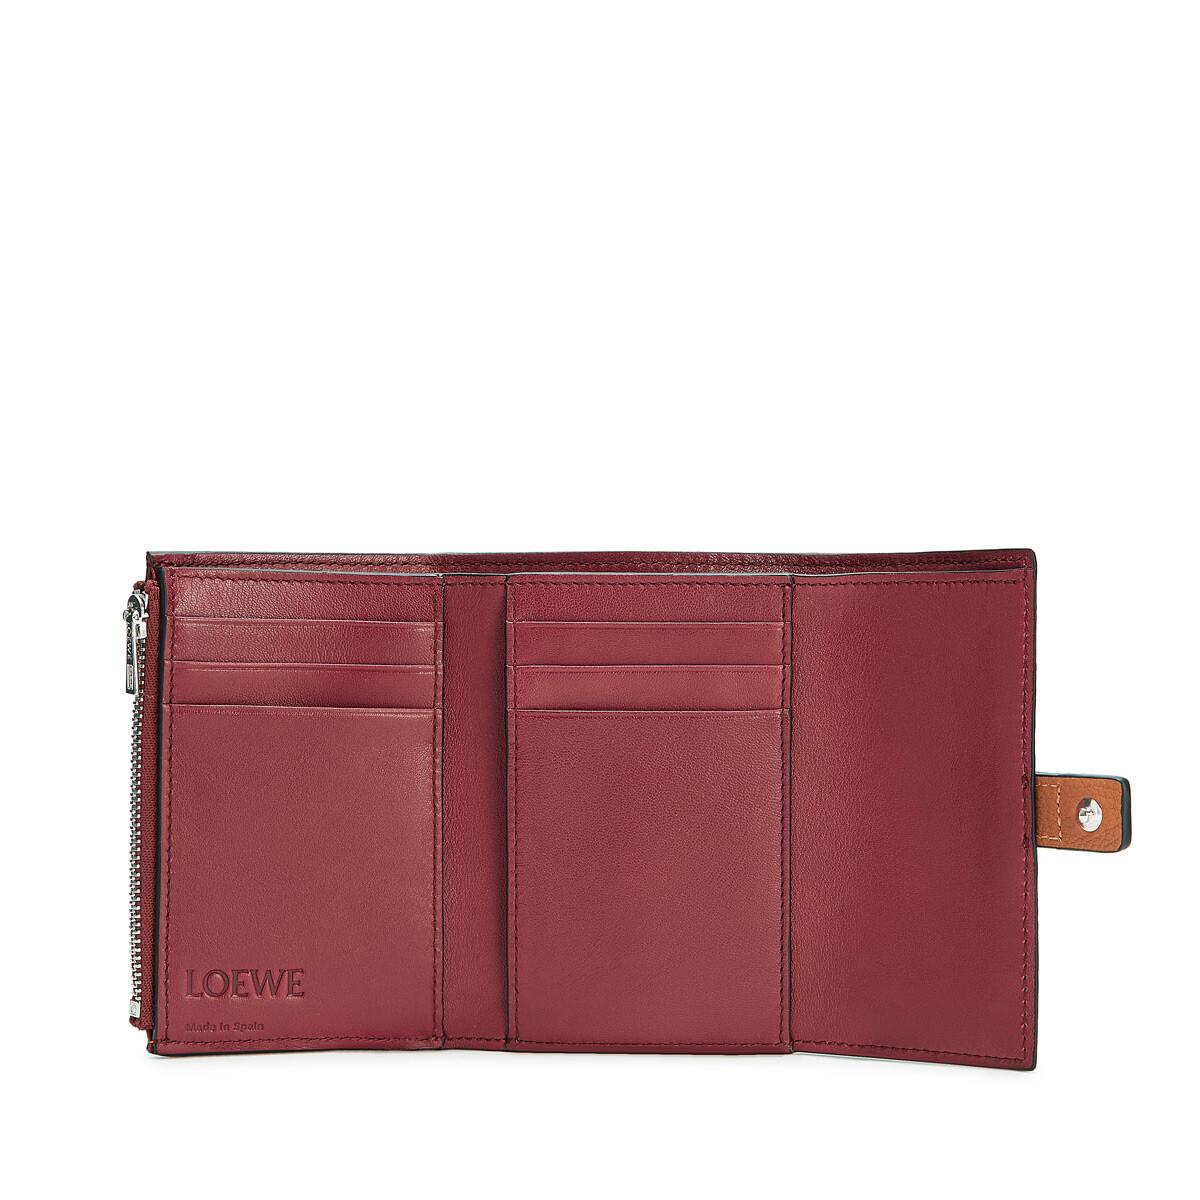 LOEWE Small Vertical Wallet Light Caramel/Pecan front